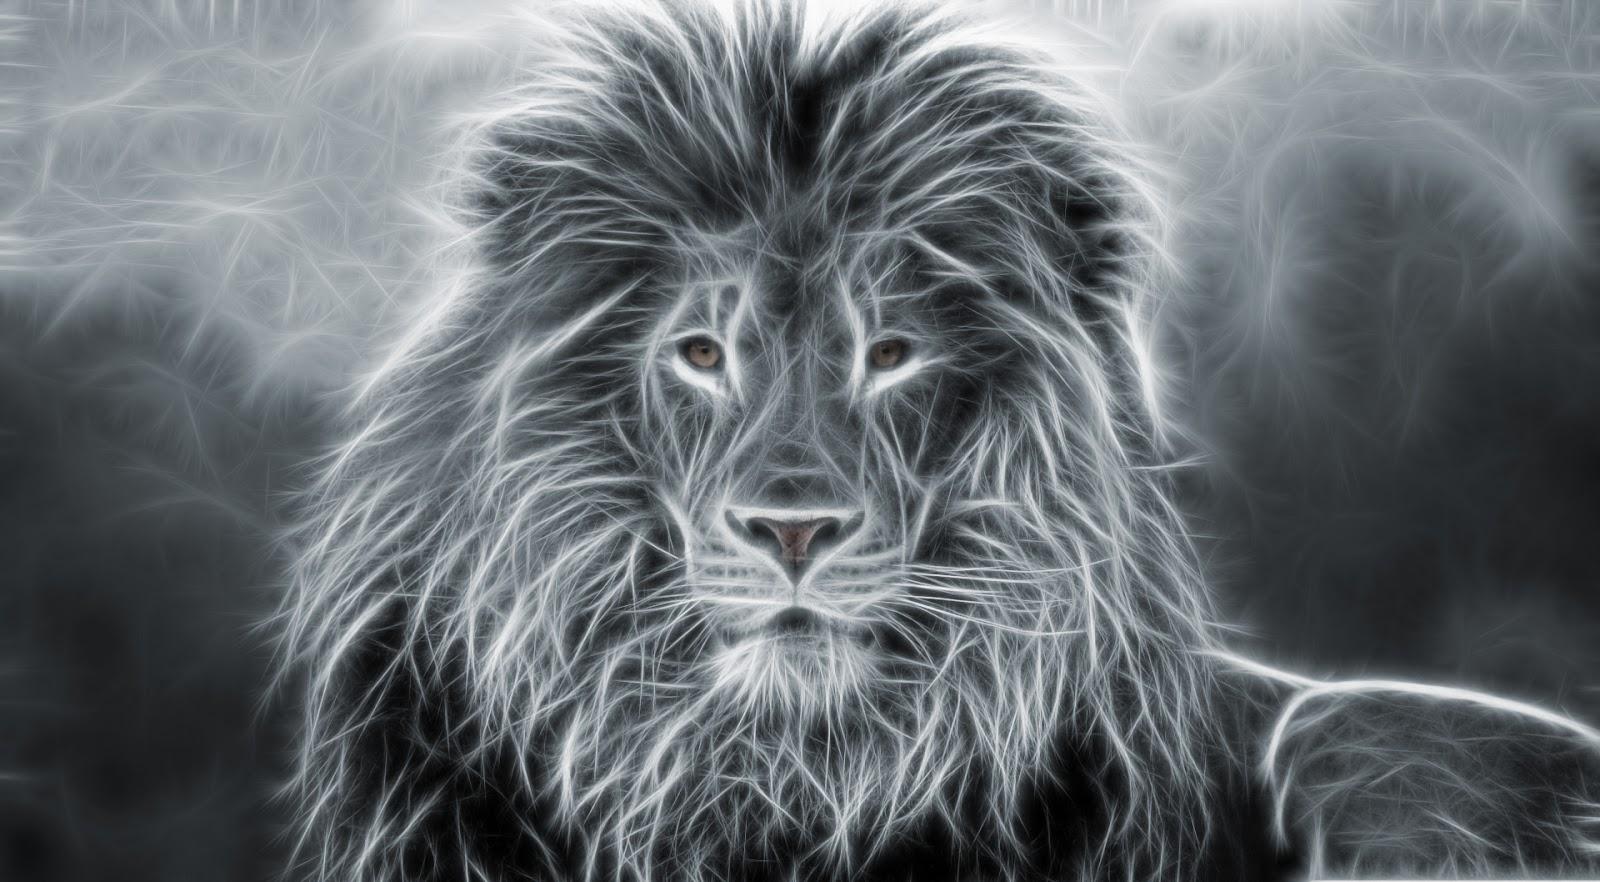 Animals Wallpapers, Animals Top Wallpapers, خلفيات طيور, خلفيات حيوانات, صور حيوانات, الحيوانات, Beautiful And Amazing Animals